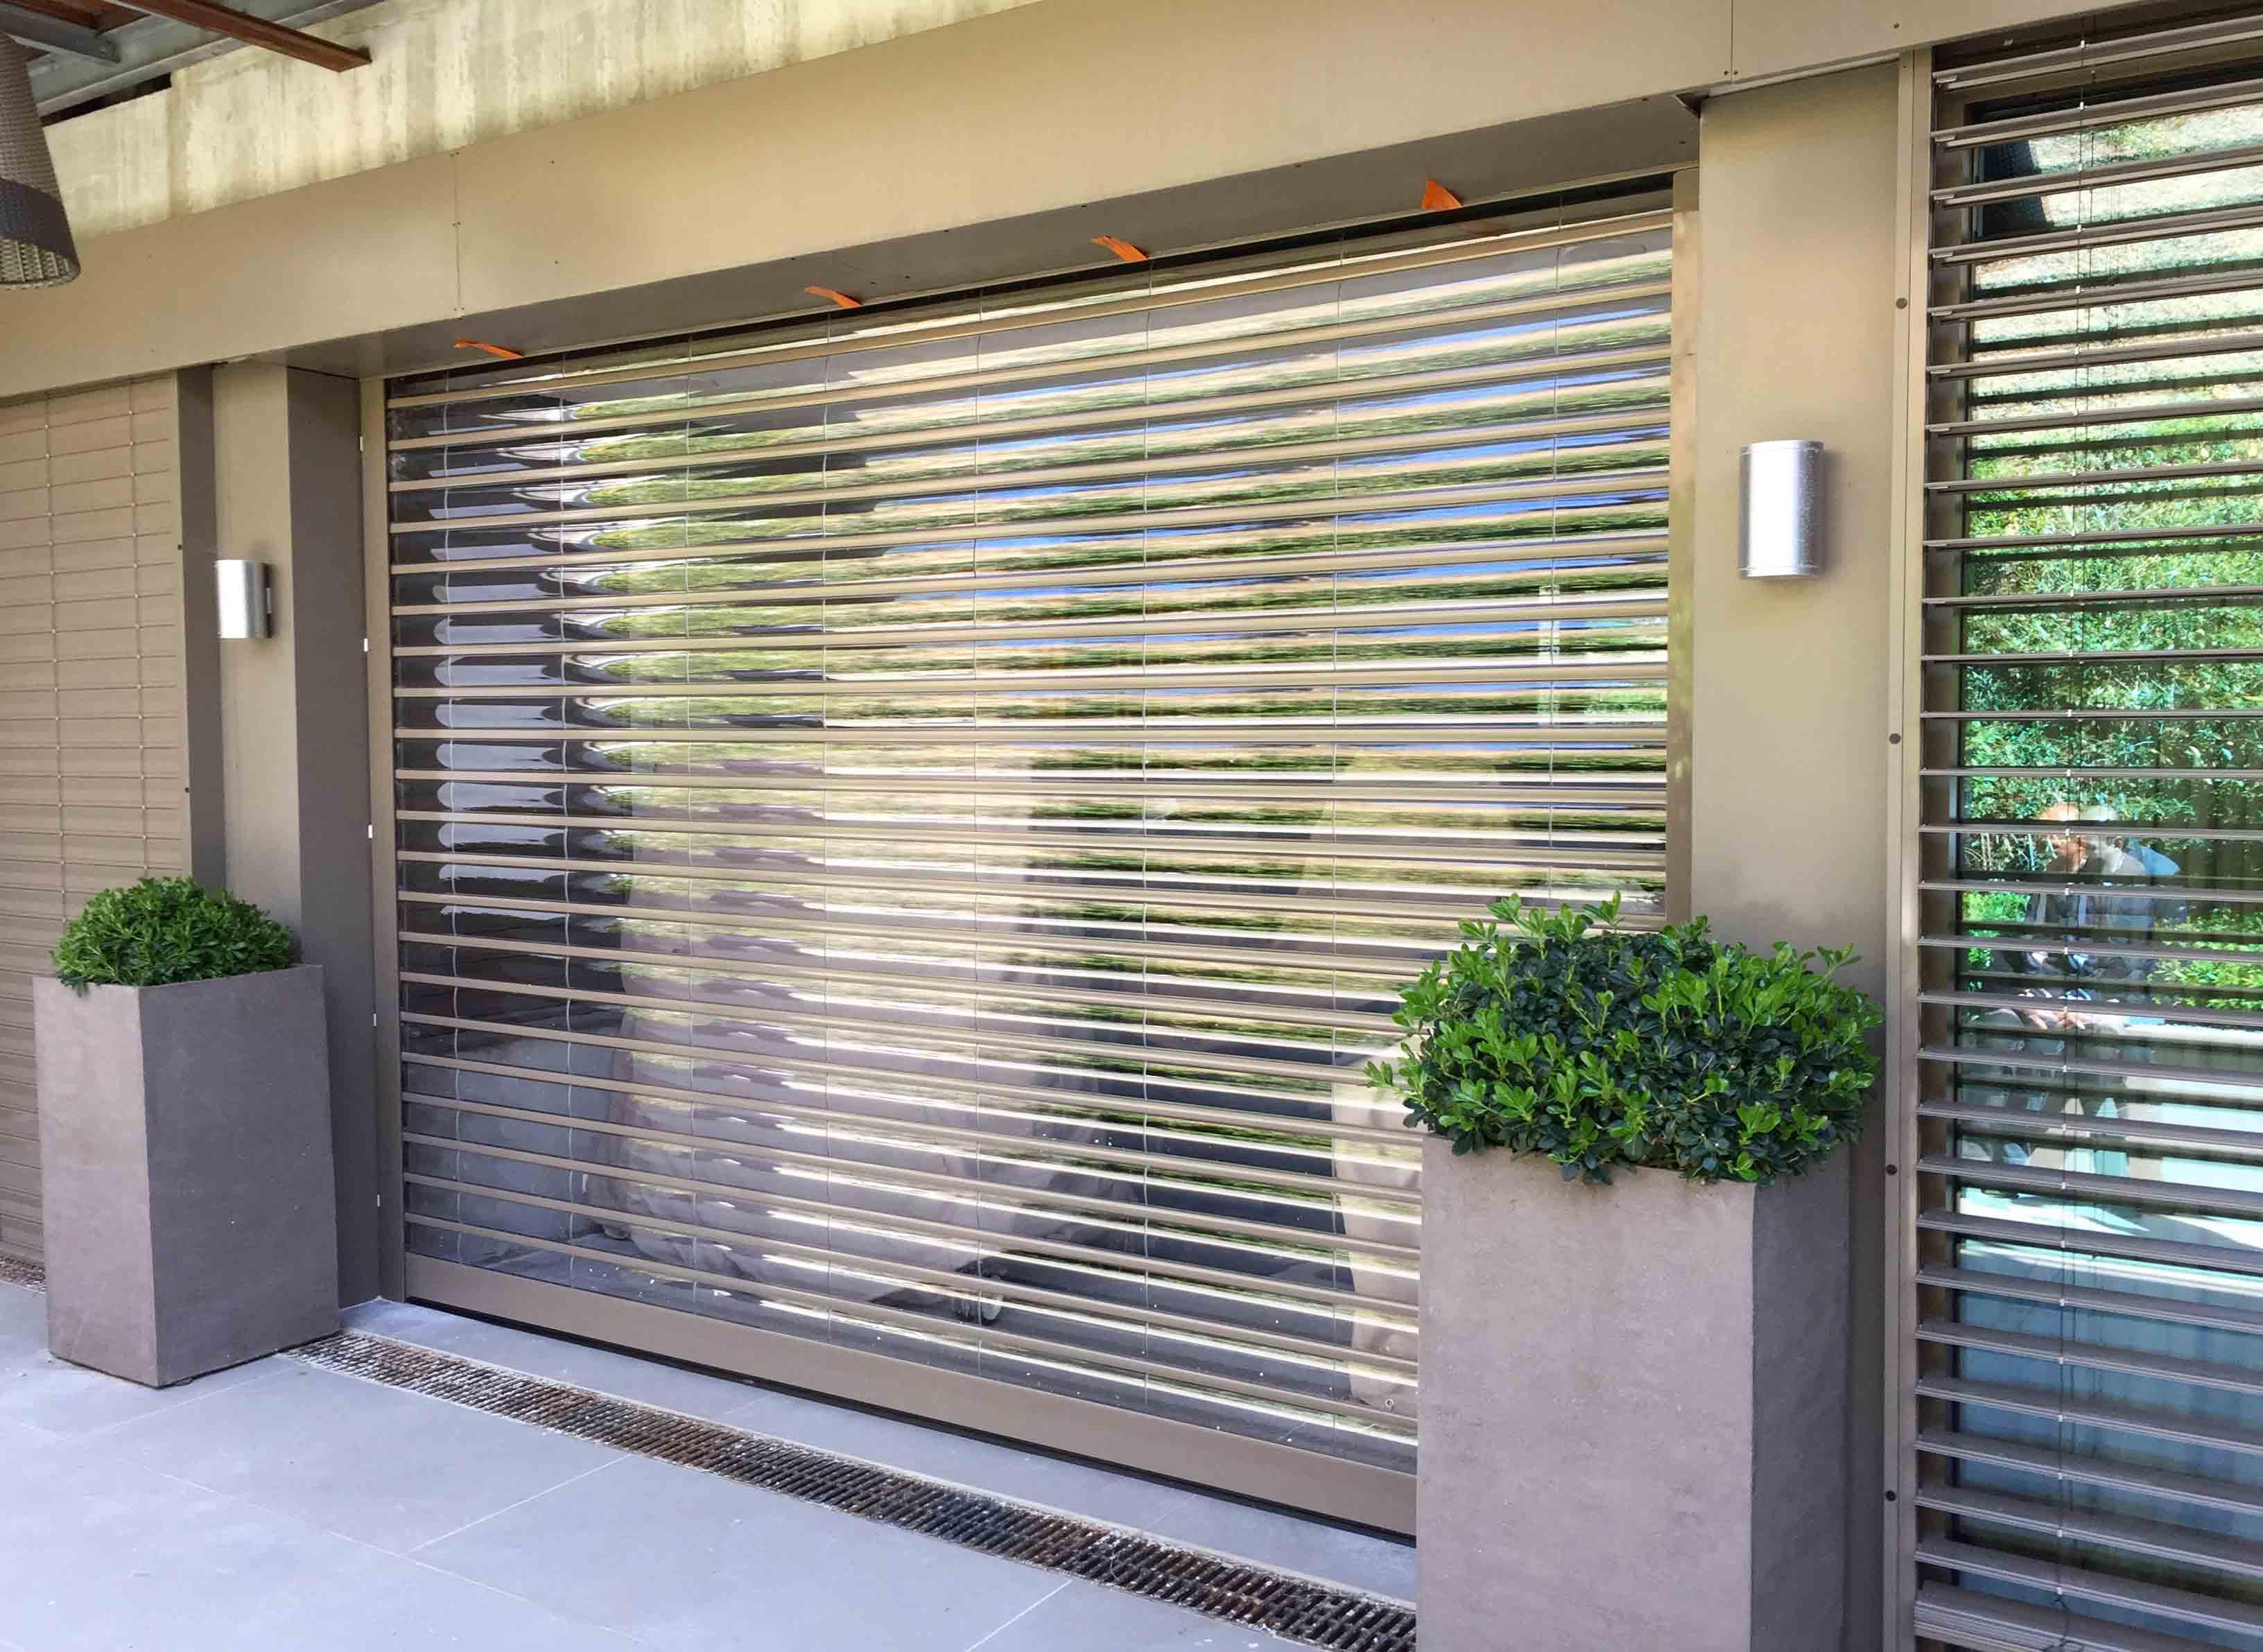 Volet roulant garage transparent – Servitec